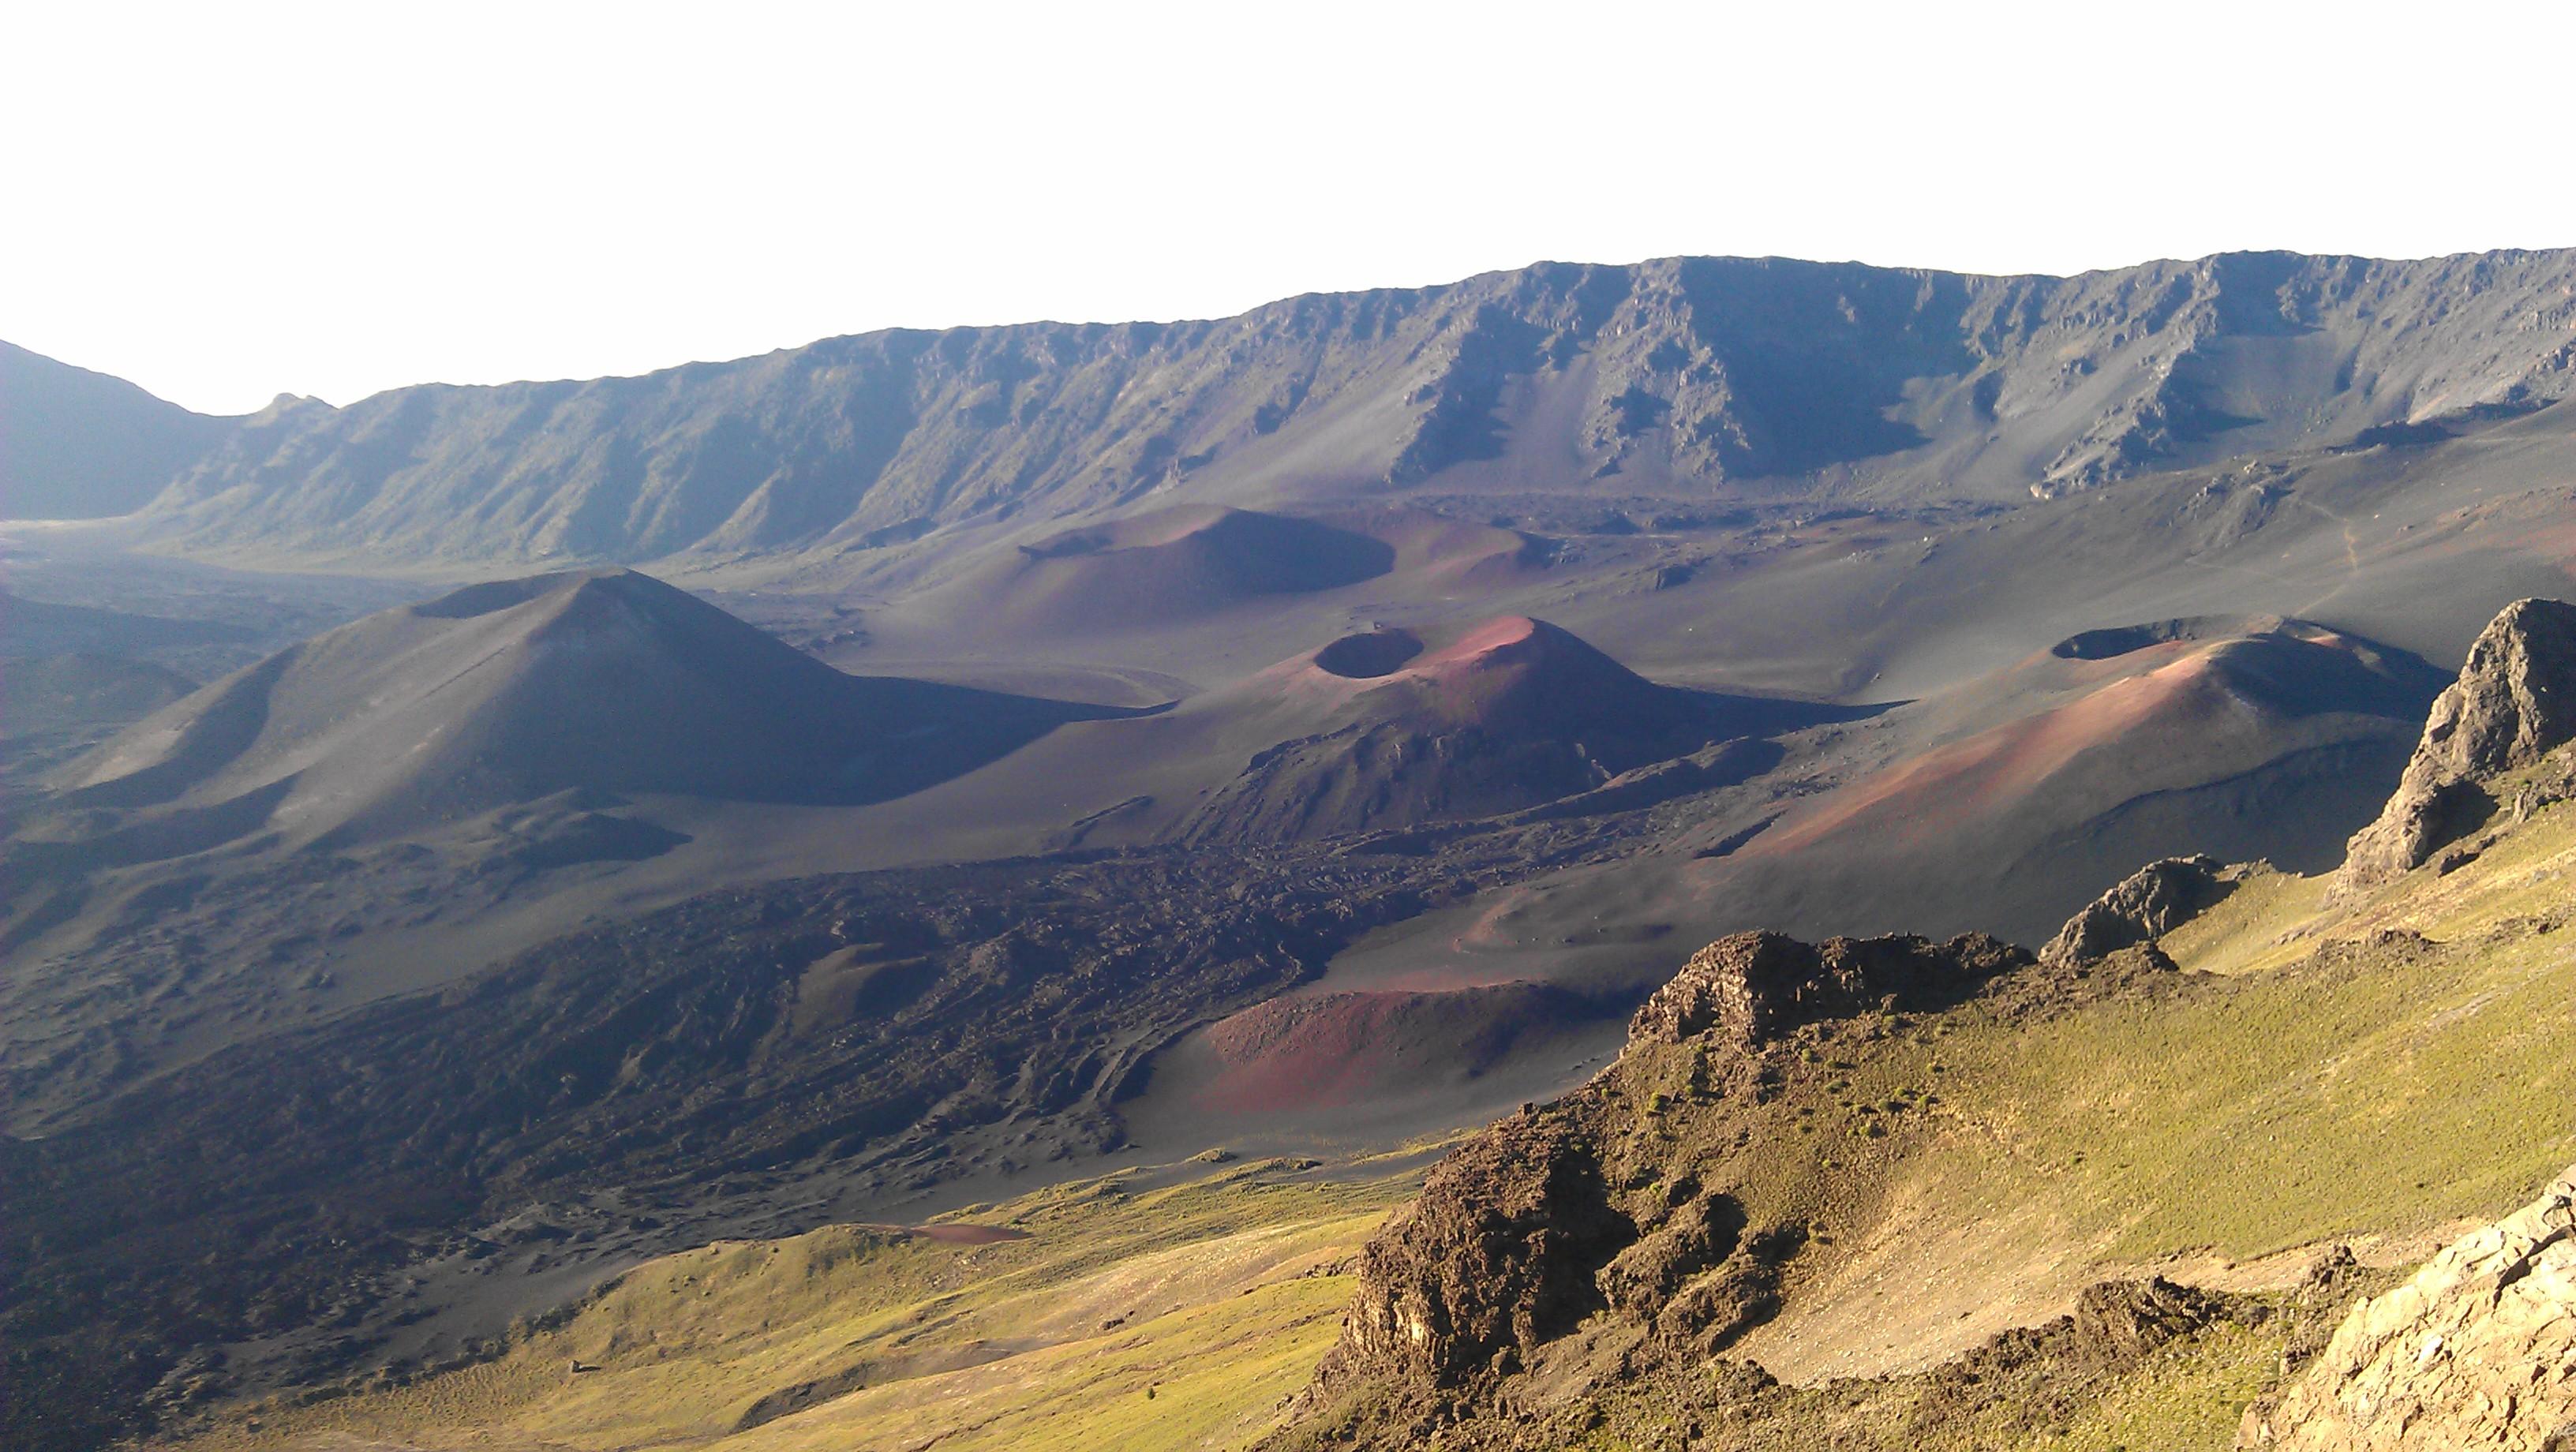 Maui/Molokai Haleakala Craters